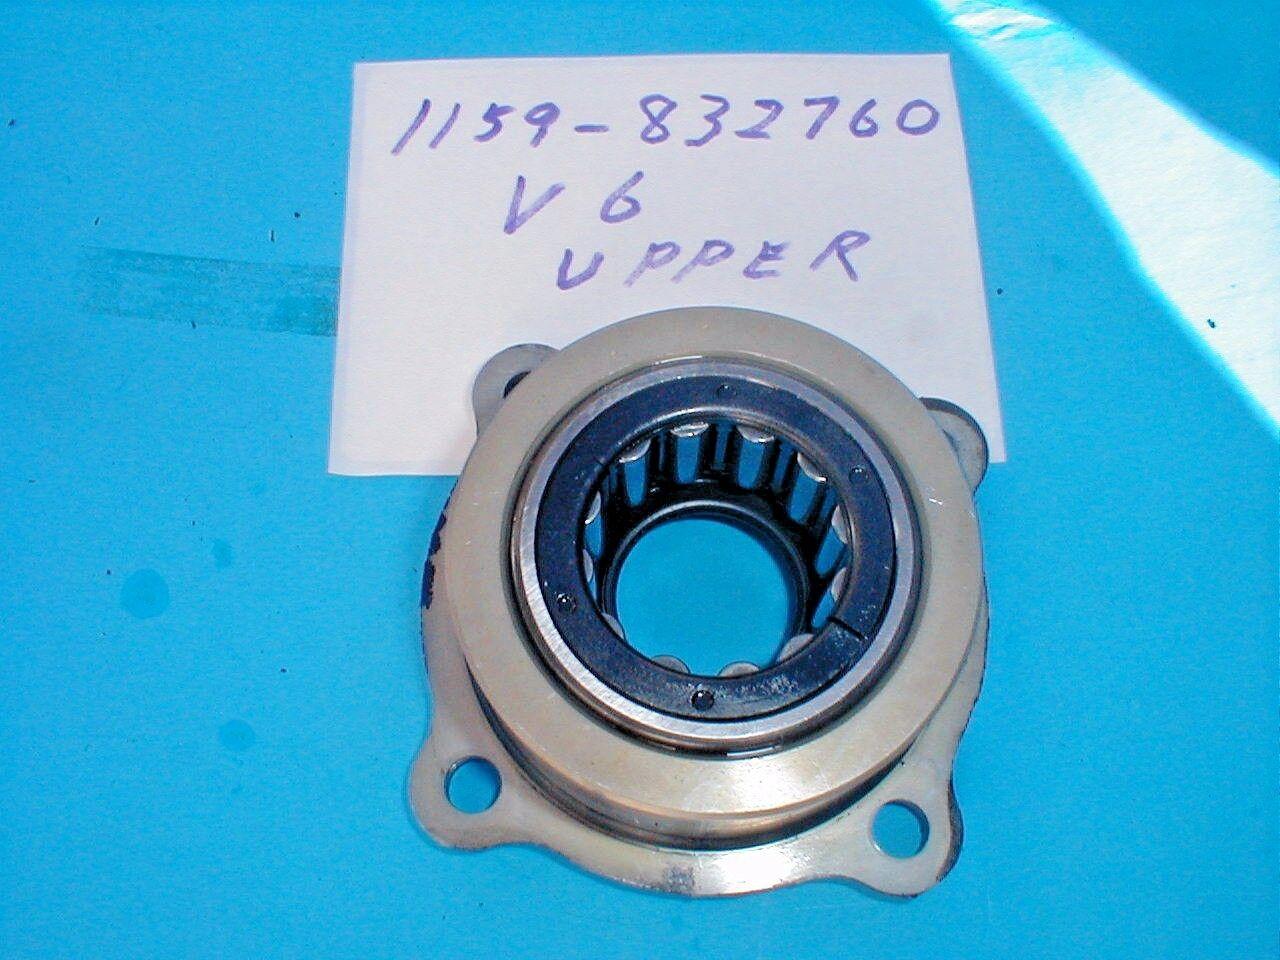 Mercury End Cap Assembly 1998-2010 135 150 175 200 210 225 240 HP 832760